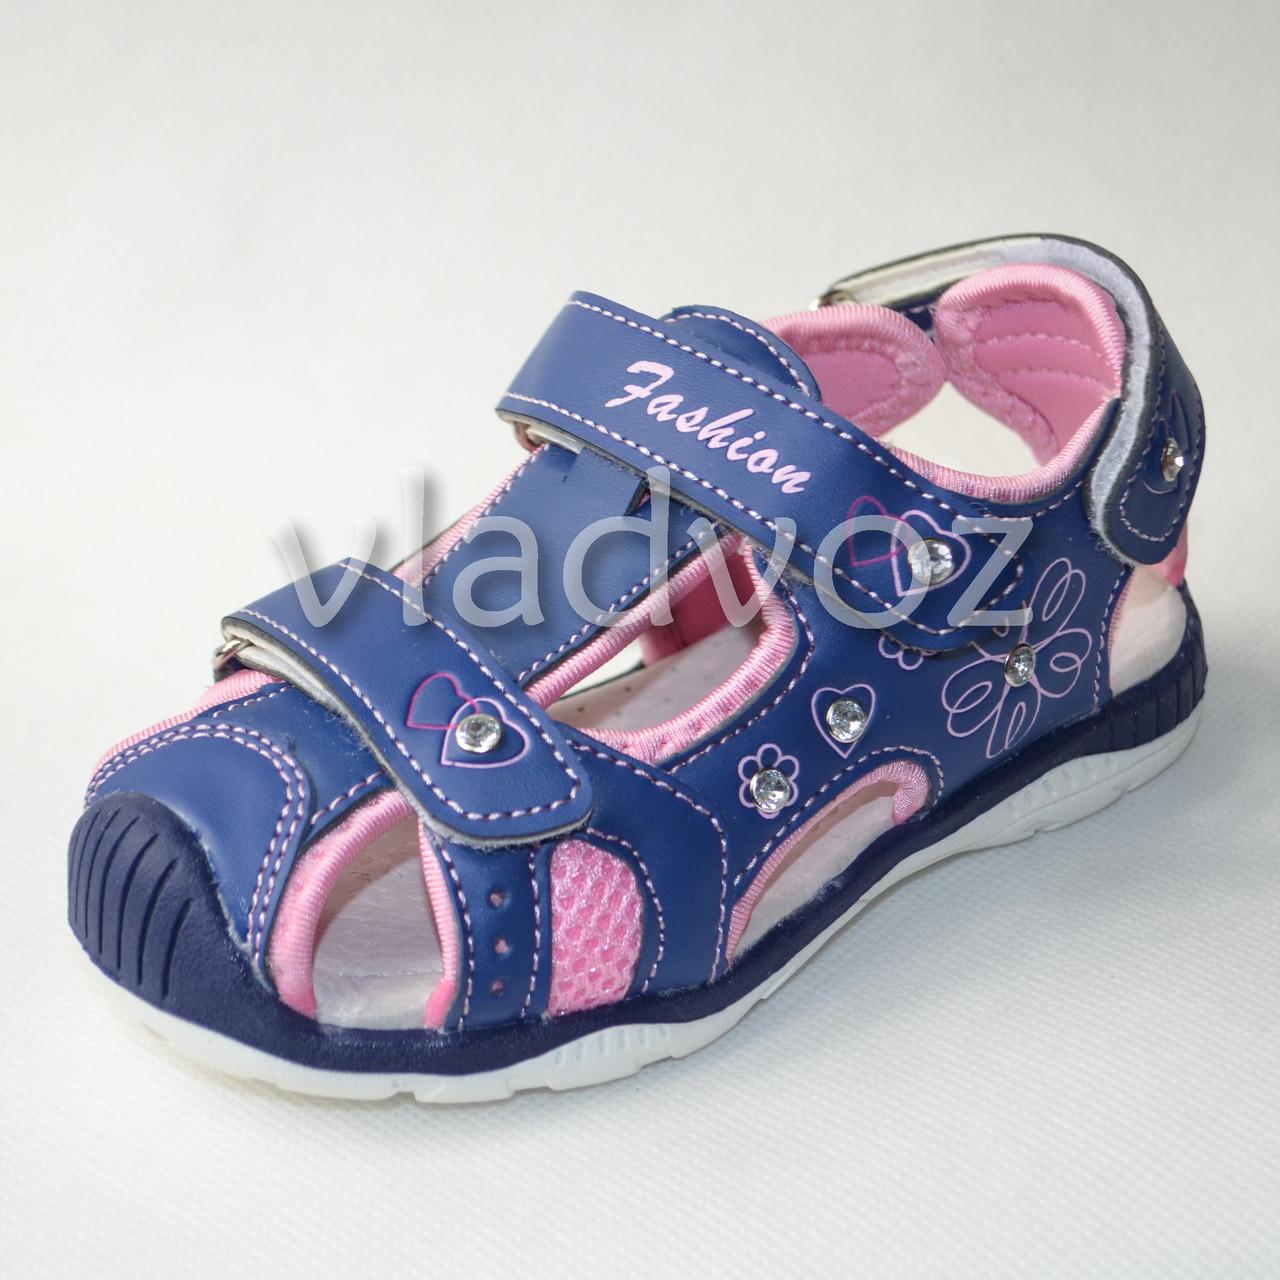 Детские босоножки сандалии для девочки на девочек синие Tom.m 26р.